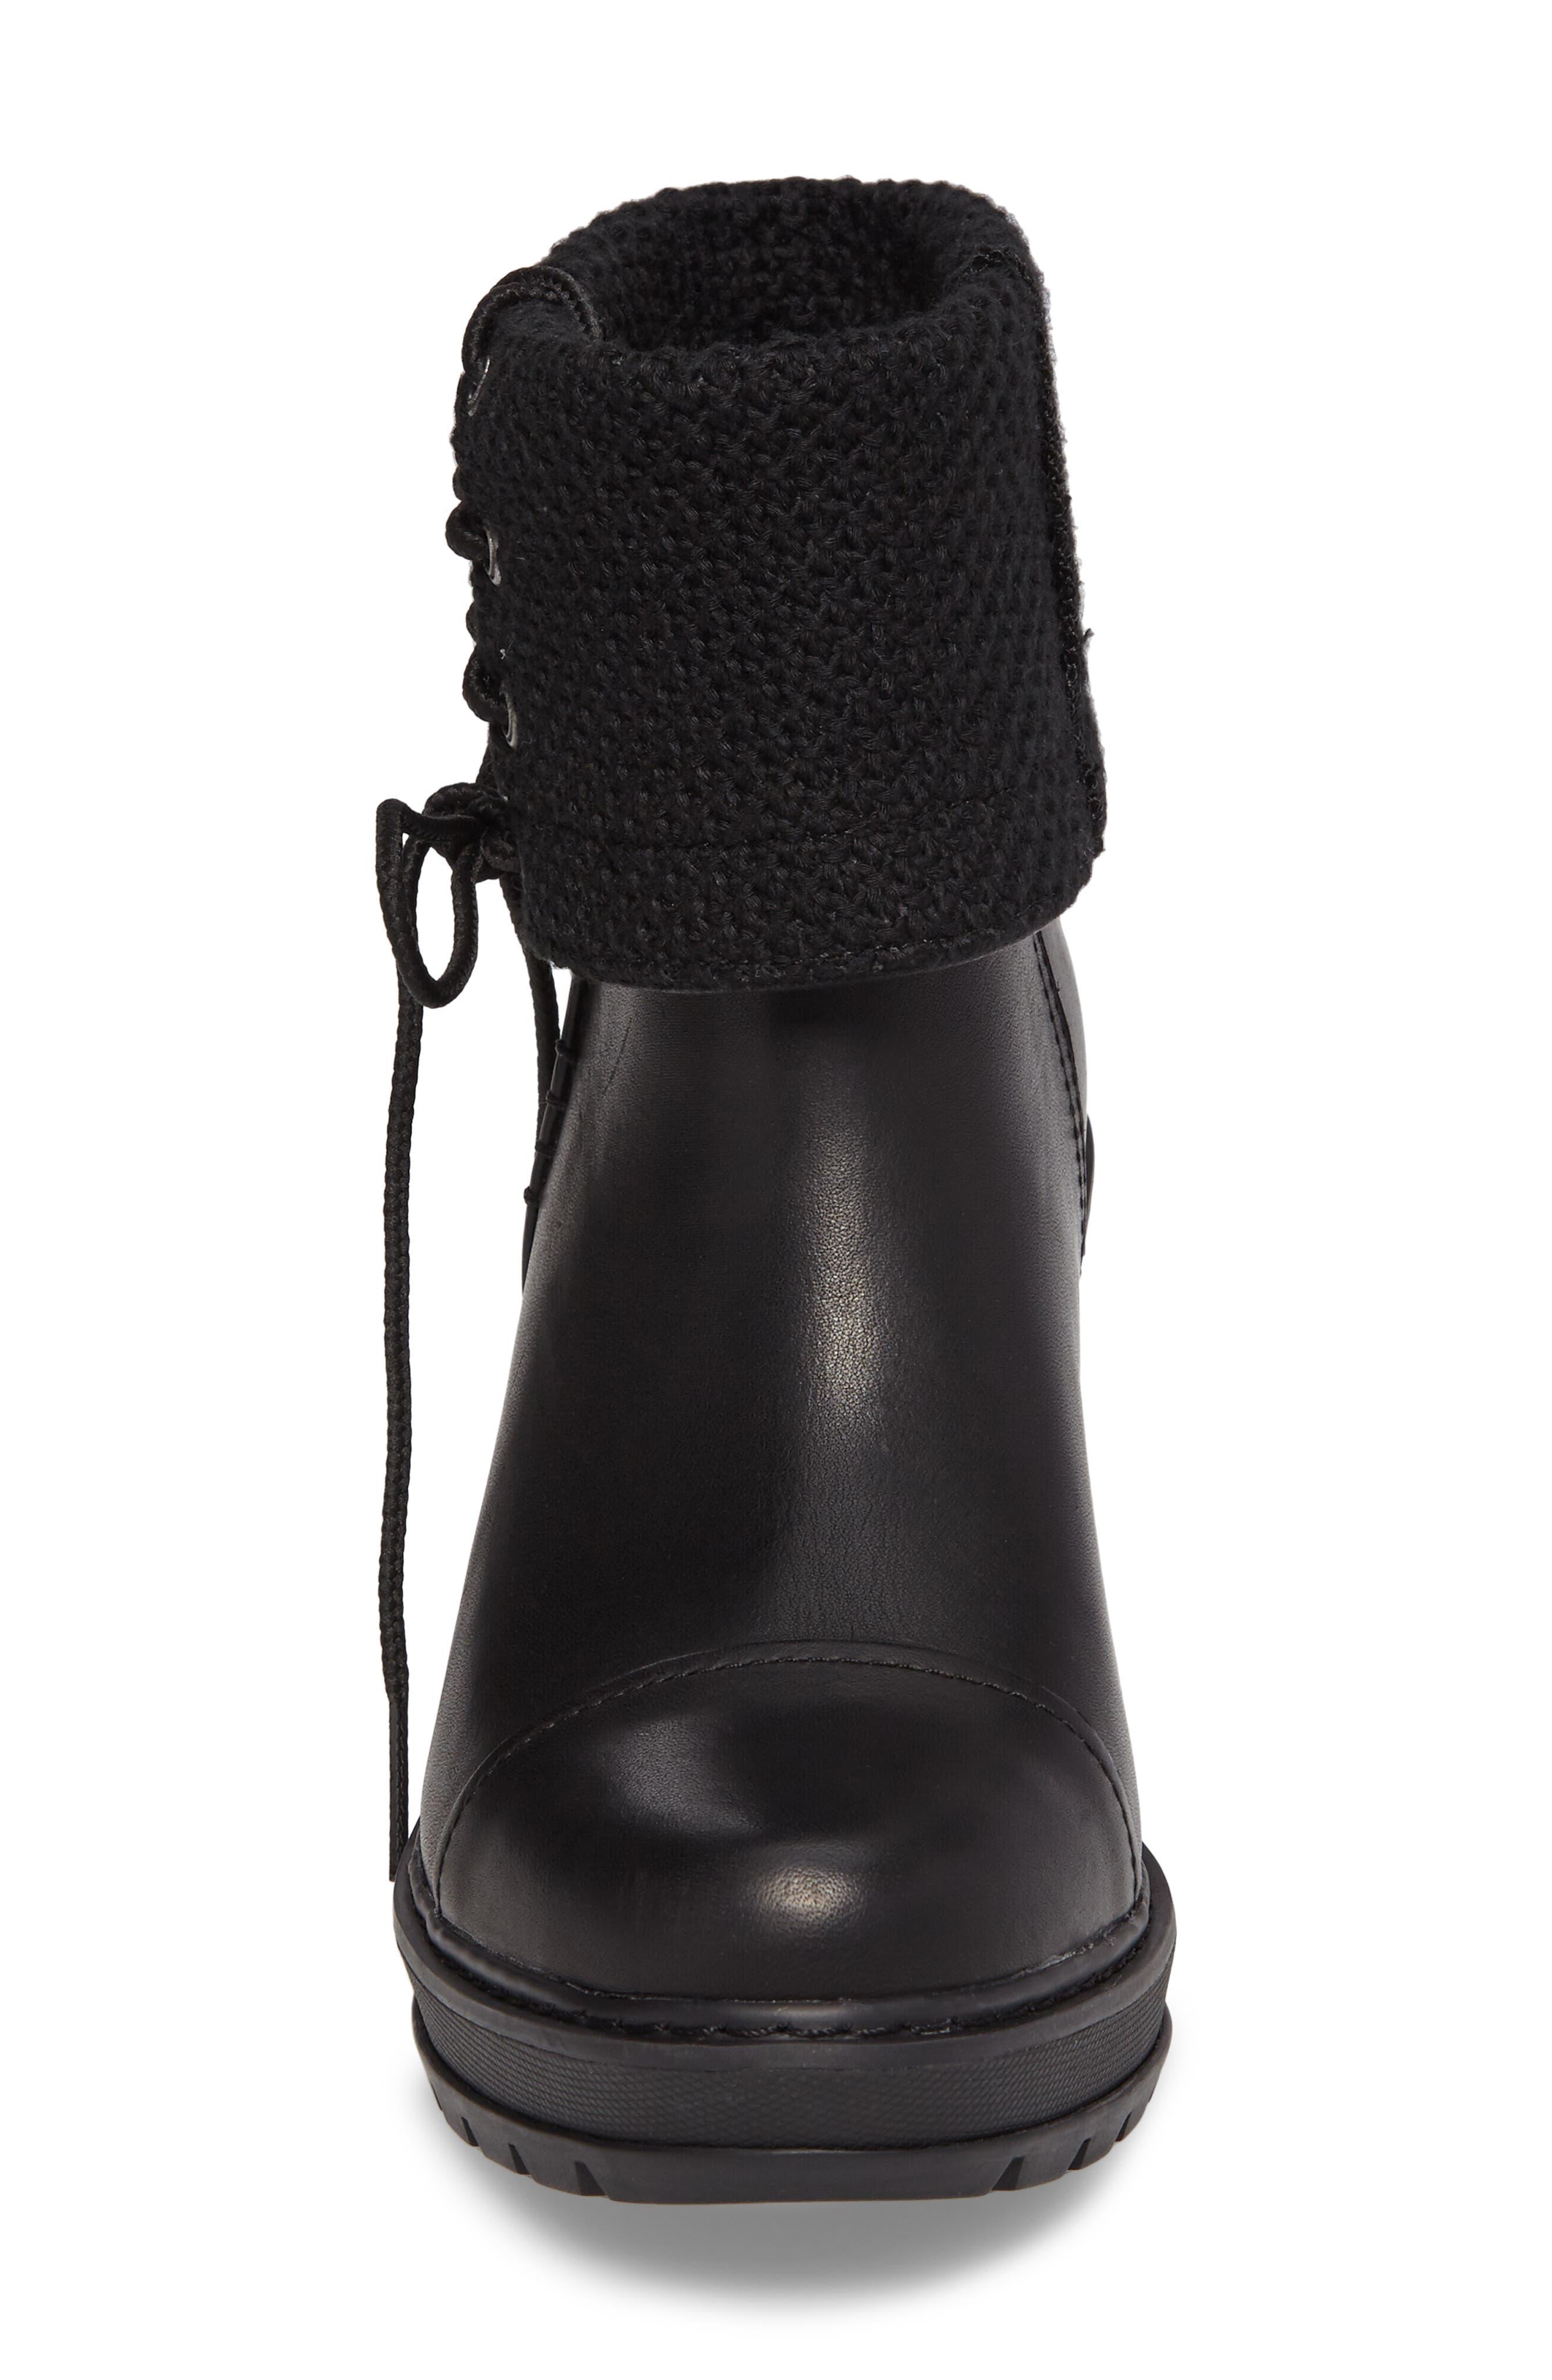 Kellis Fold Down Water Resistant Boot,                             Alternate thumbnail 4, color,                             001